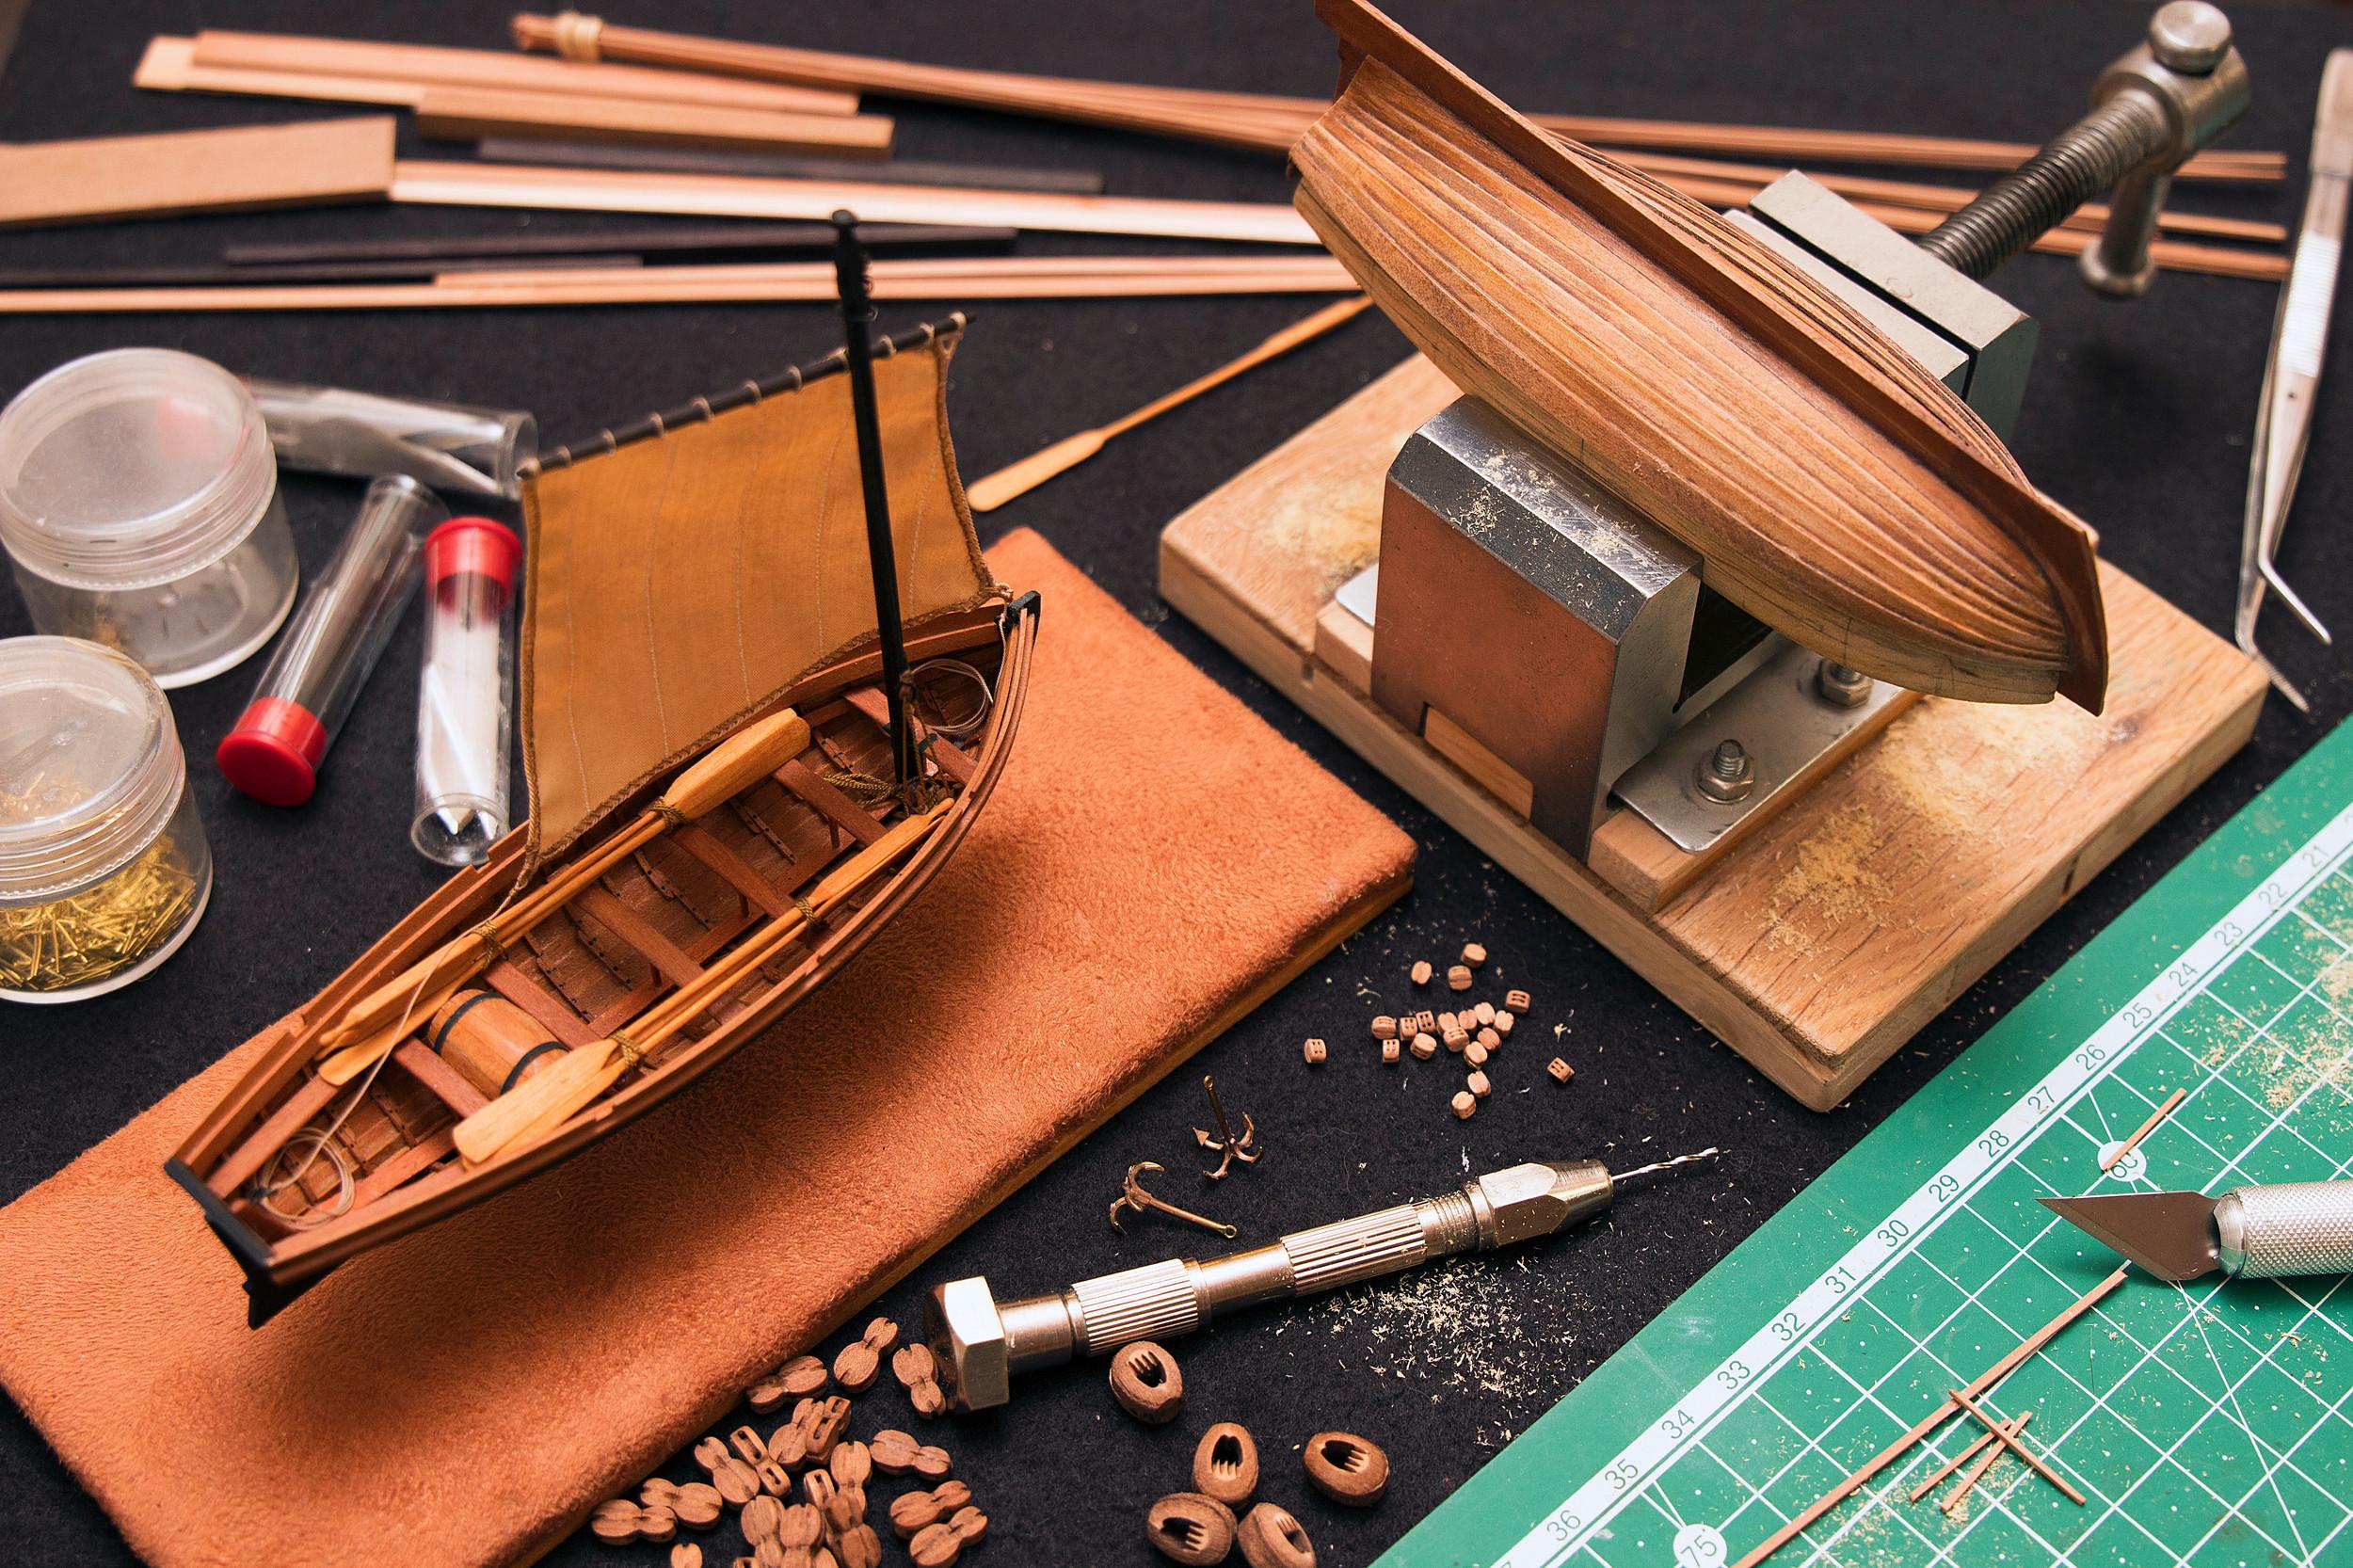 en.shipphotographer.com